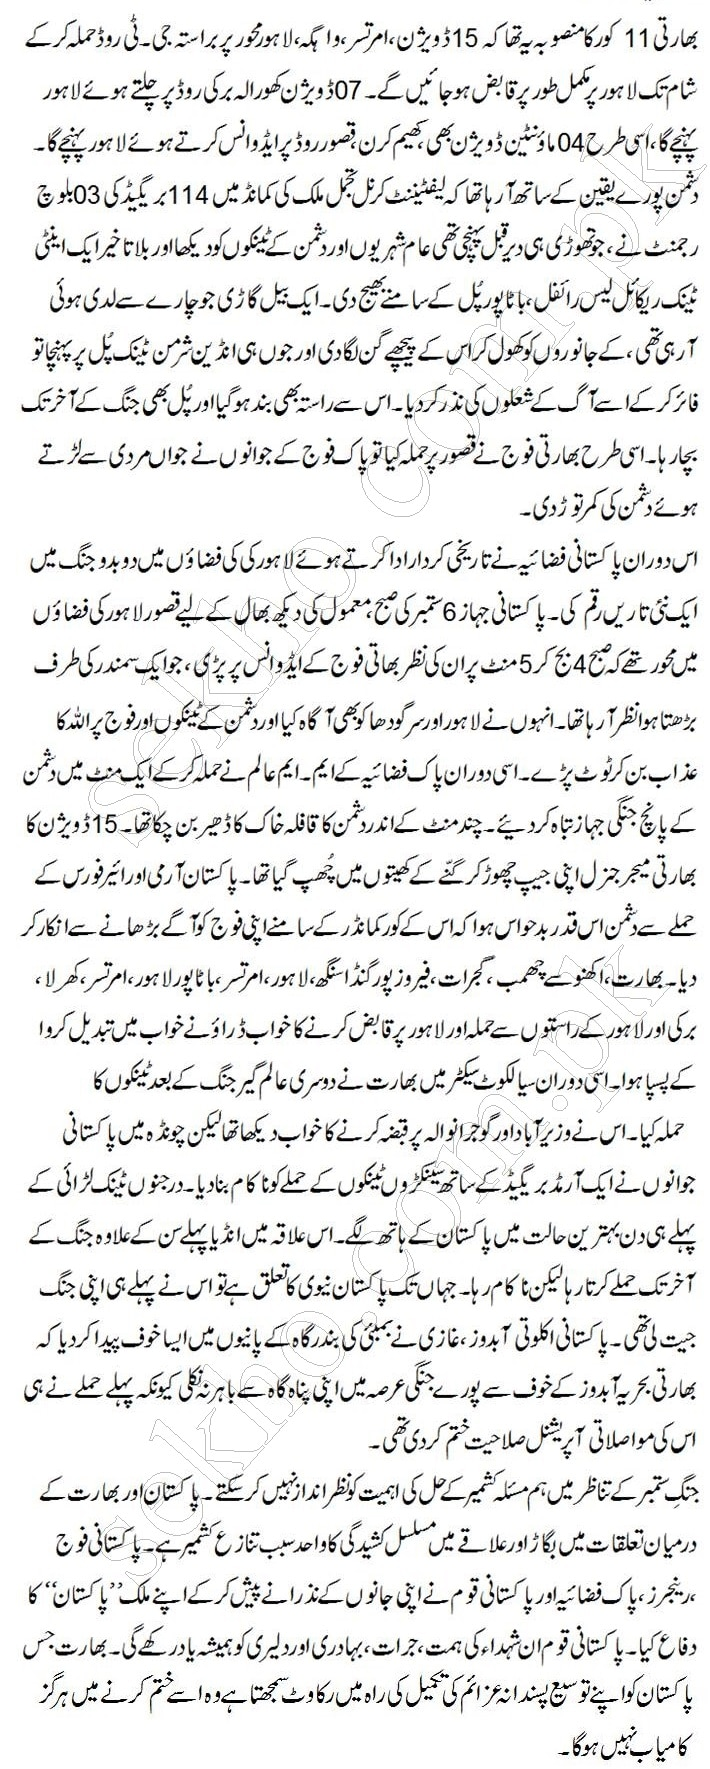 6th September 1965 Speech in Urdu Essay